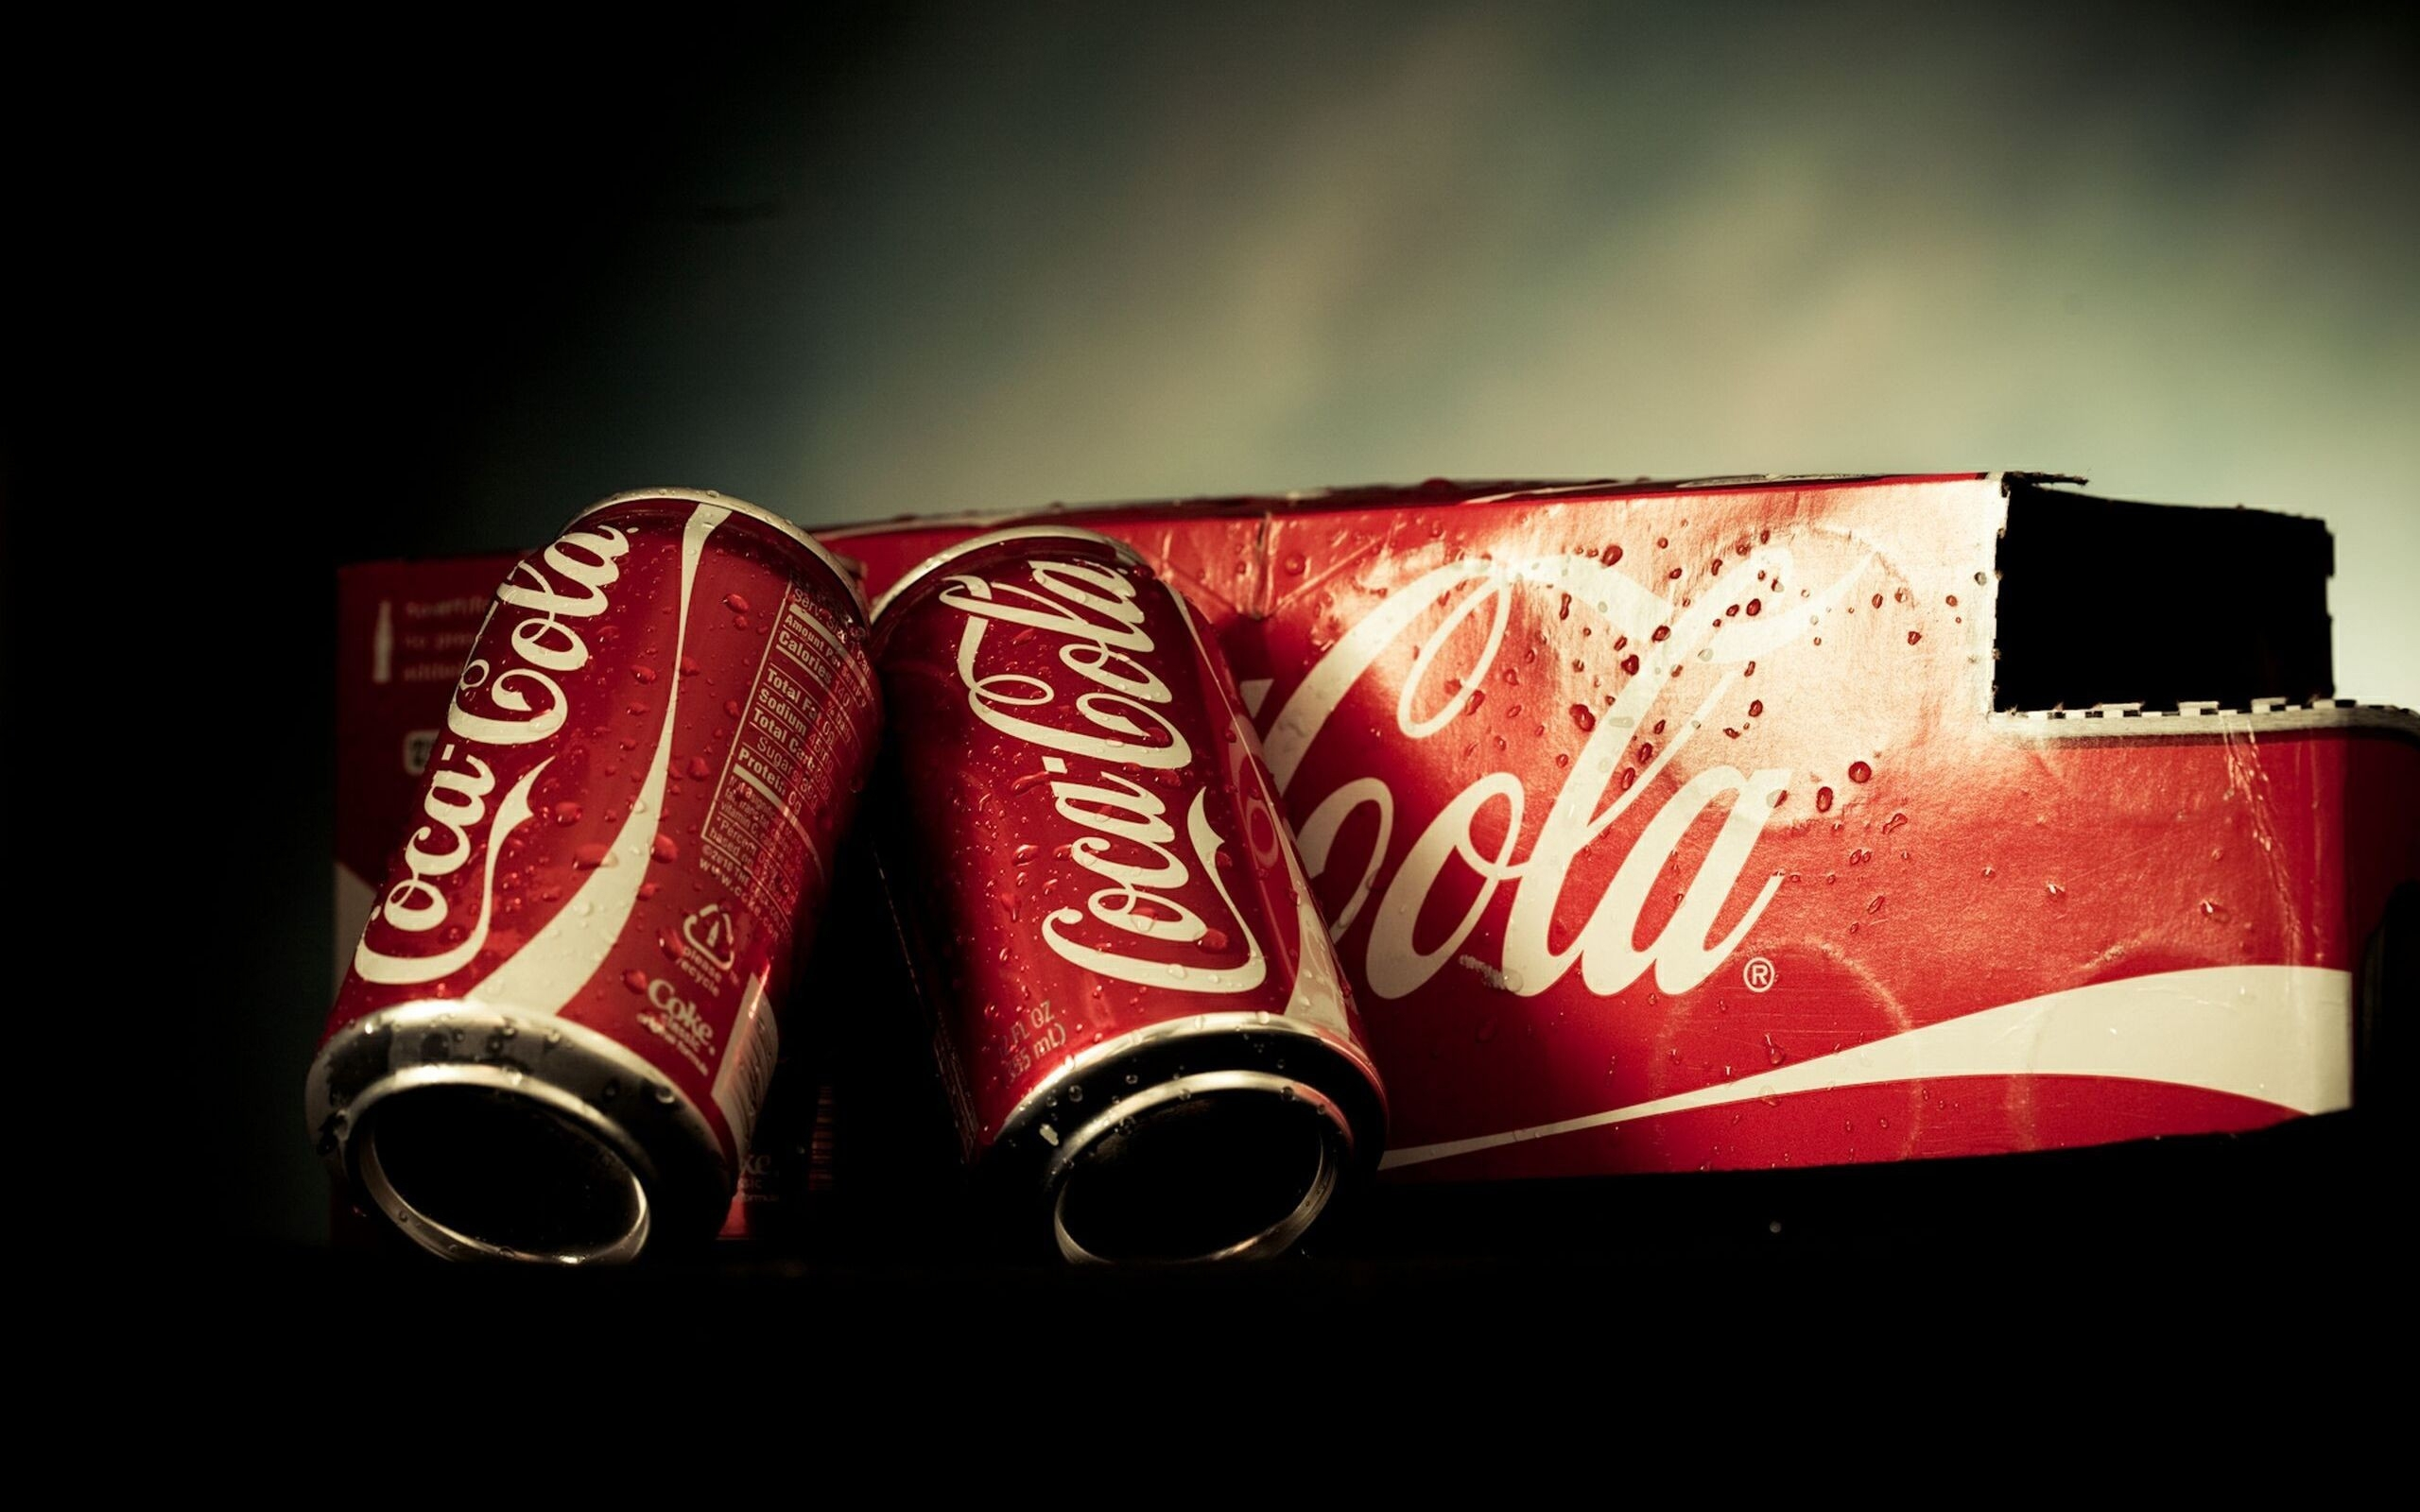 coca cola full hd fond d'écran and arrière-plan | 2560x1600 | id:210100